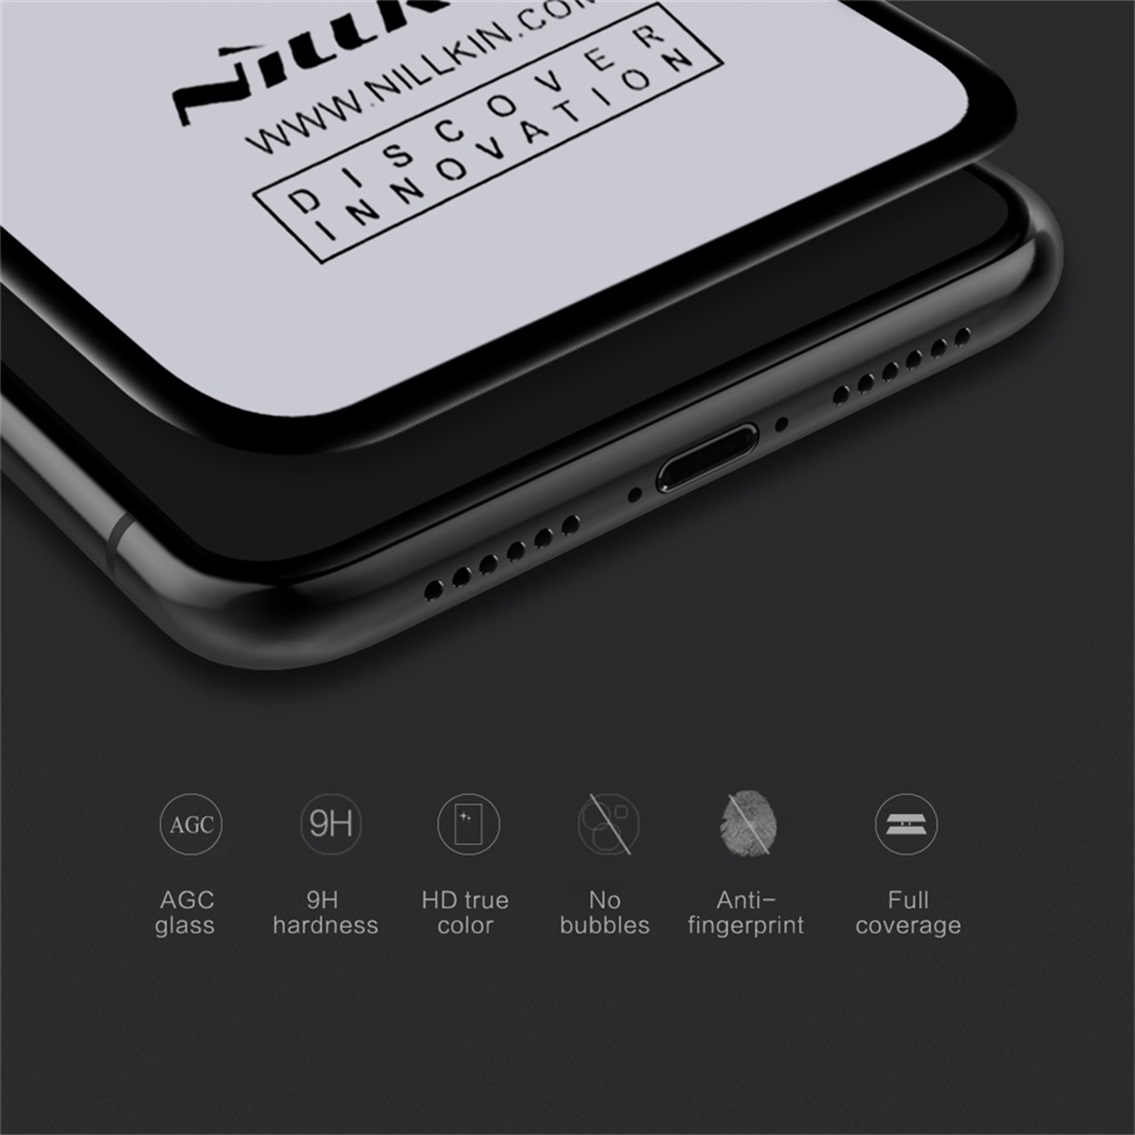 3D vidrio templado para el iPhone XS Max Protector de pantalla para iPhone XR/XS/X NILLKIN cubierta completa anti-burst película protectora